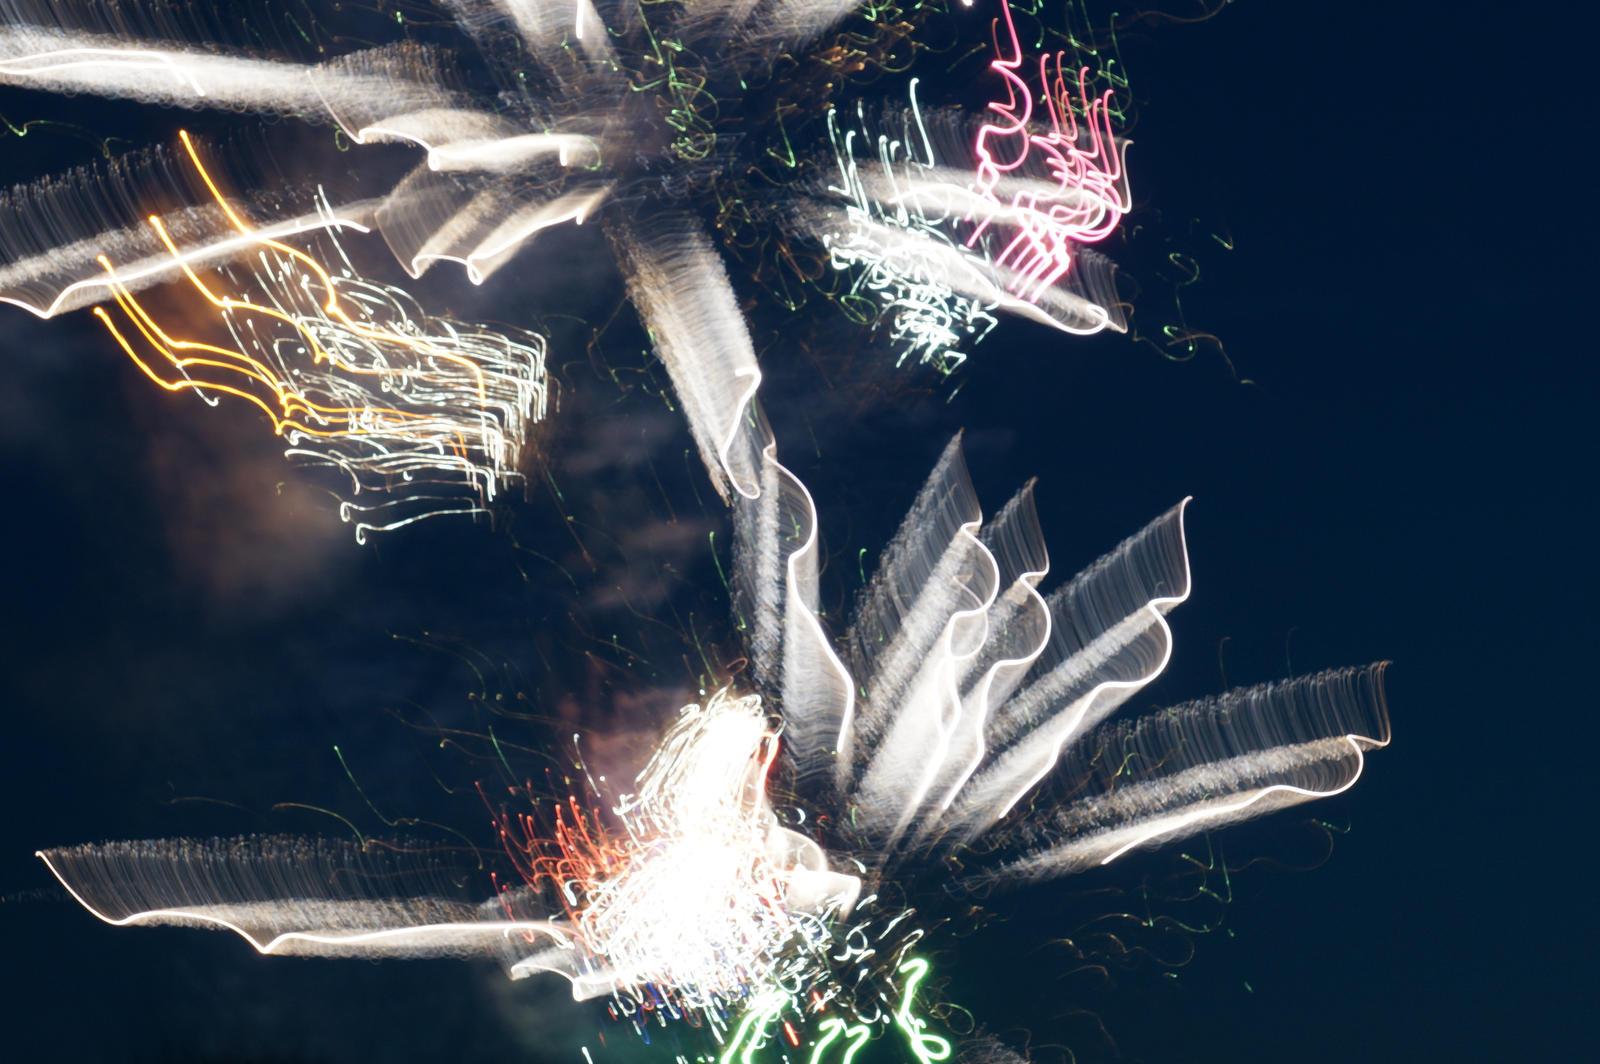 Distorted Fireworks 002